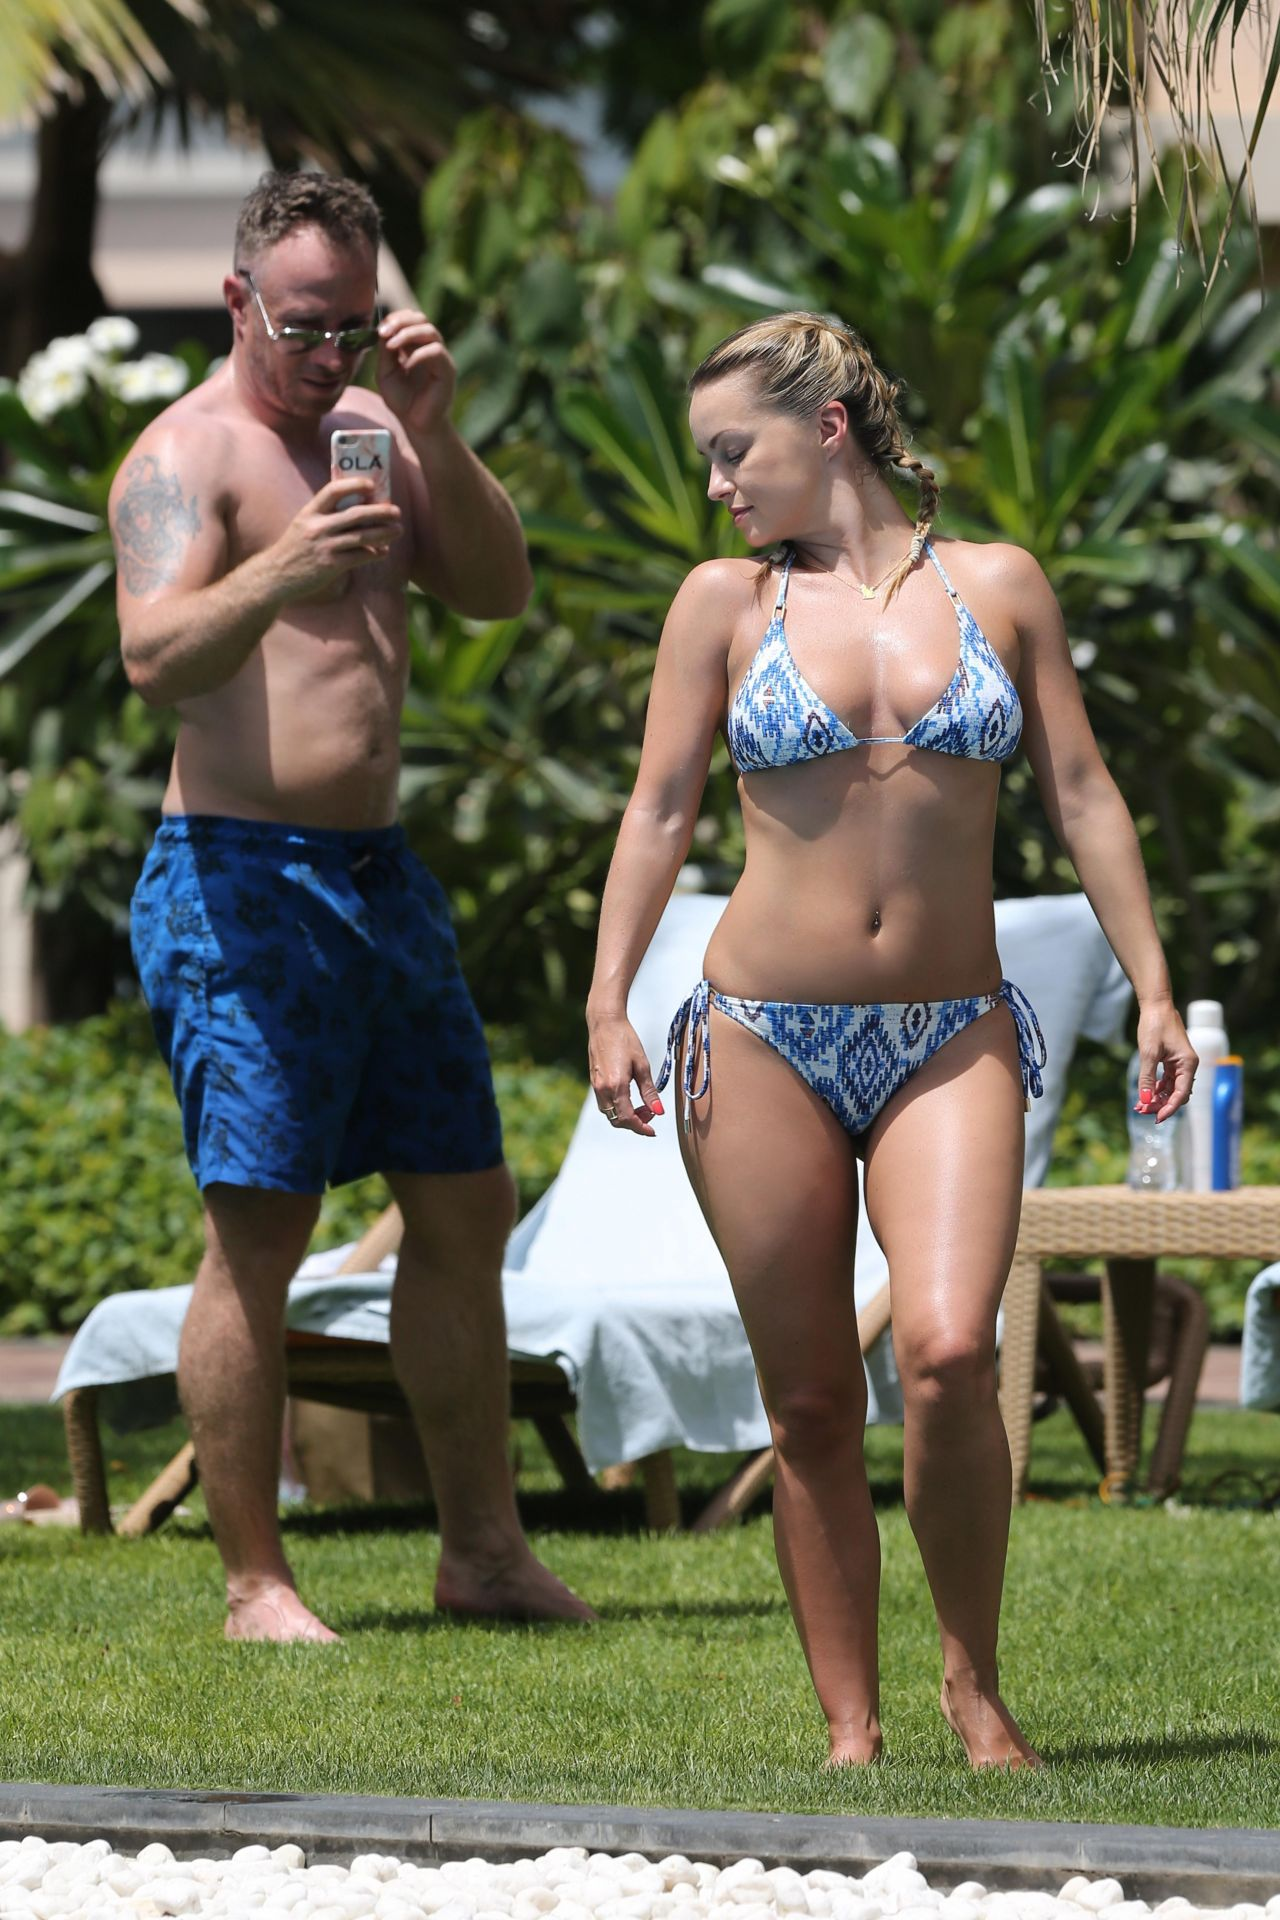 Ola jordan bikini poolside in dubai - 2019 year